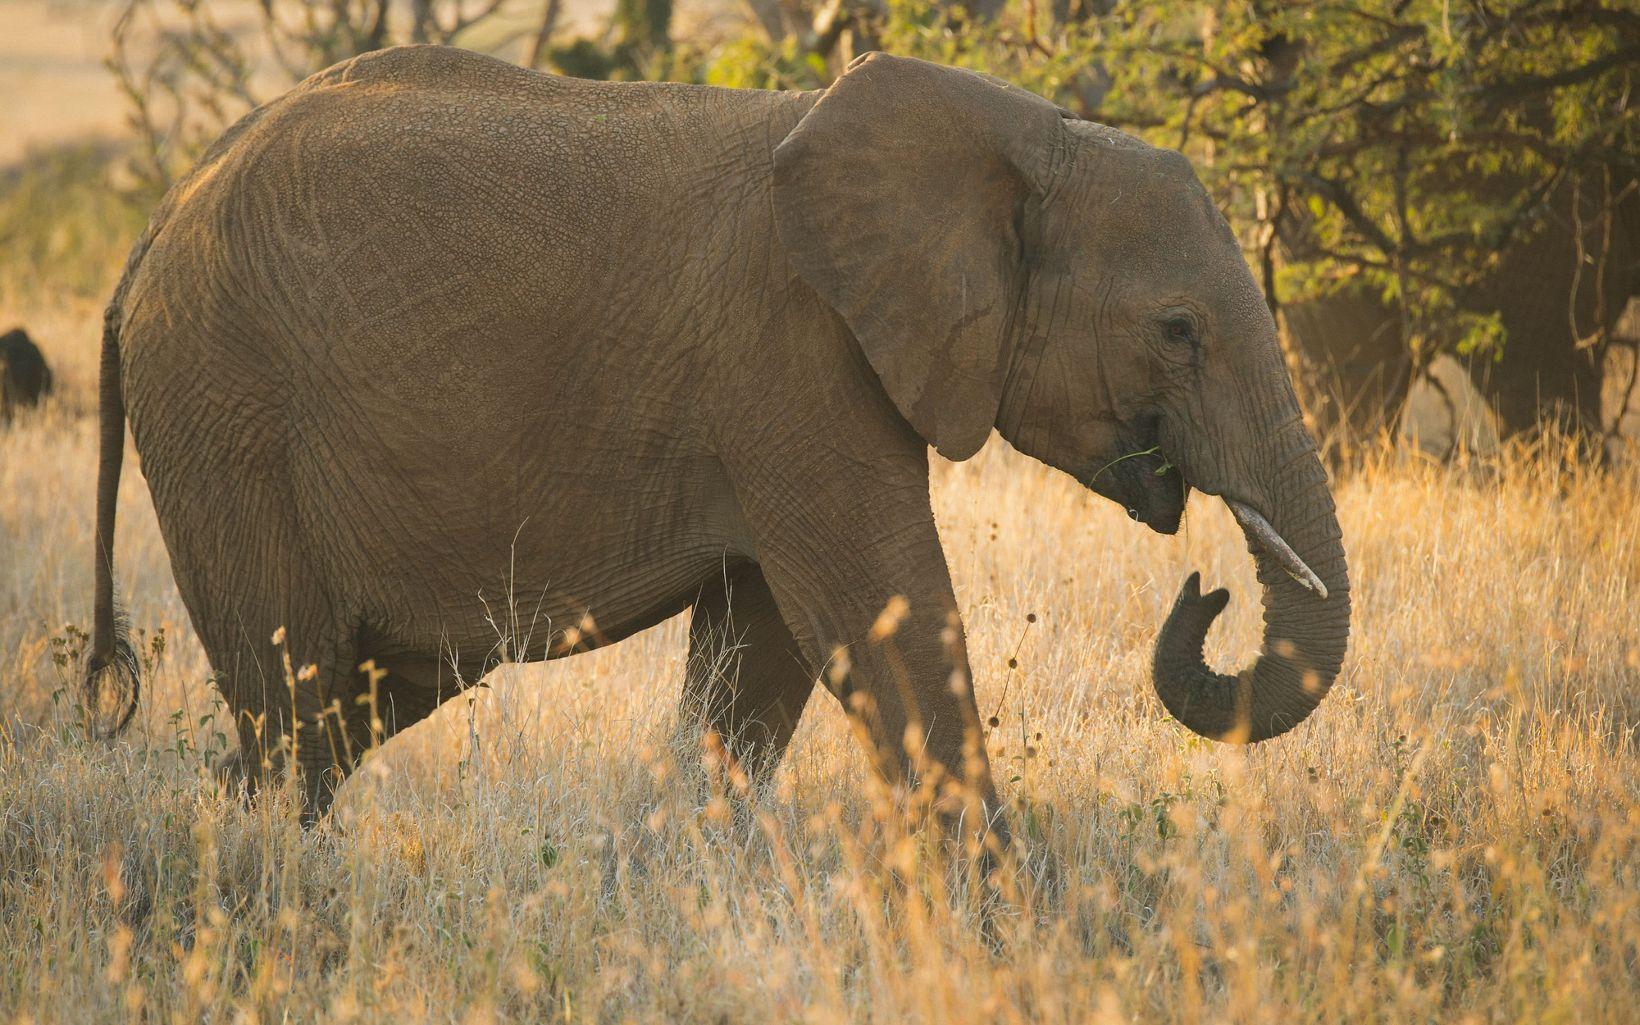 at the Lewa Wildlife Conservancy in Northern Kenya.